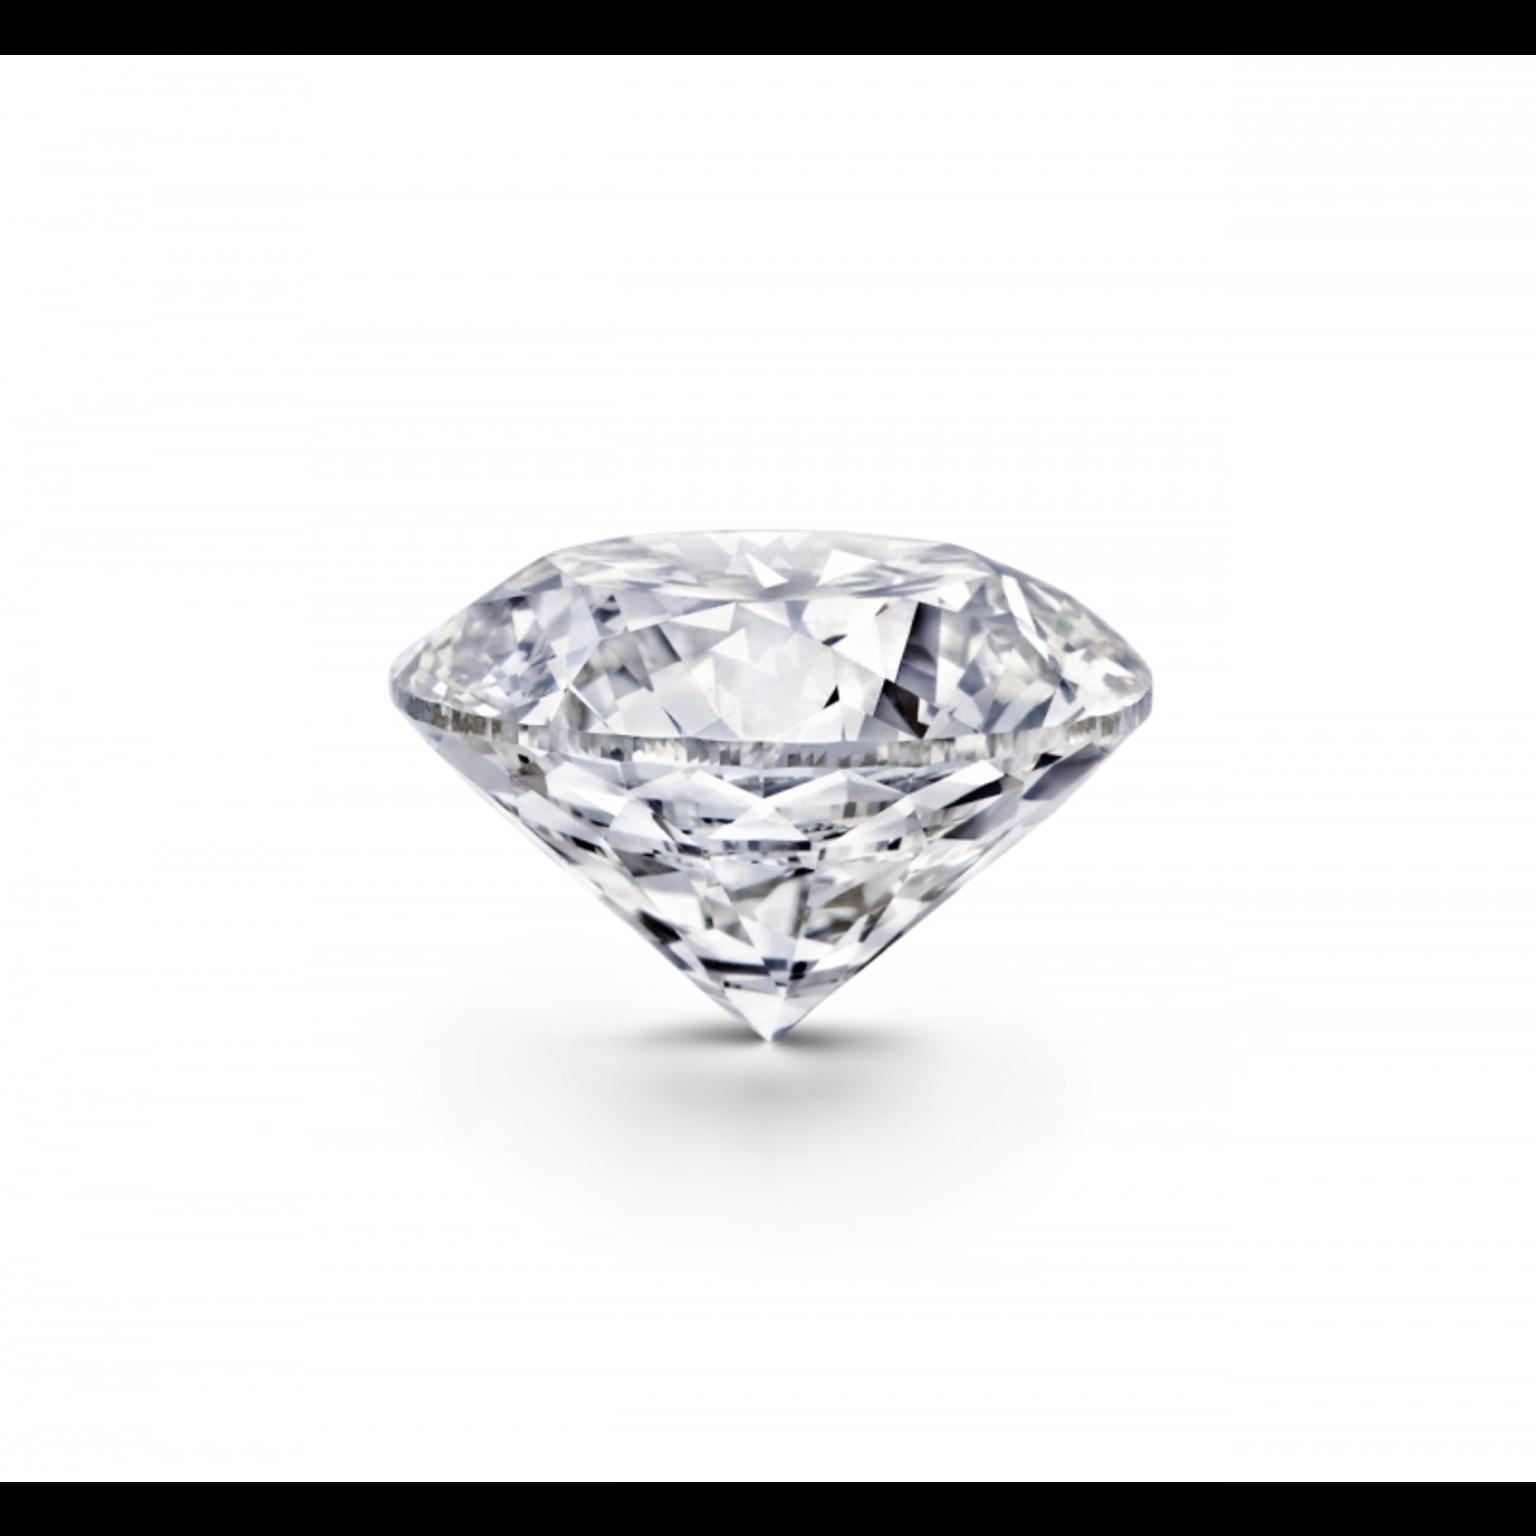 GASSAN 121® cut diamond